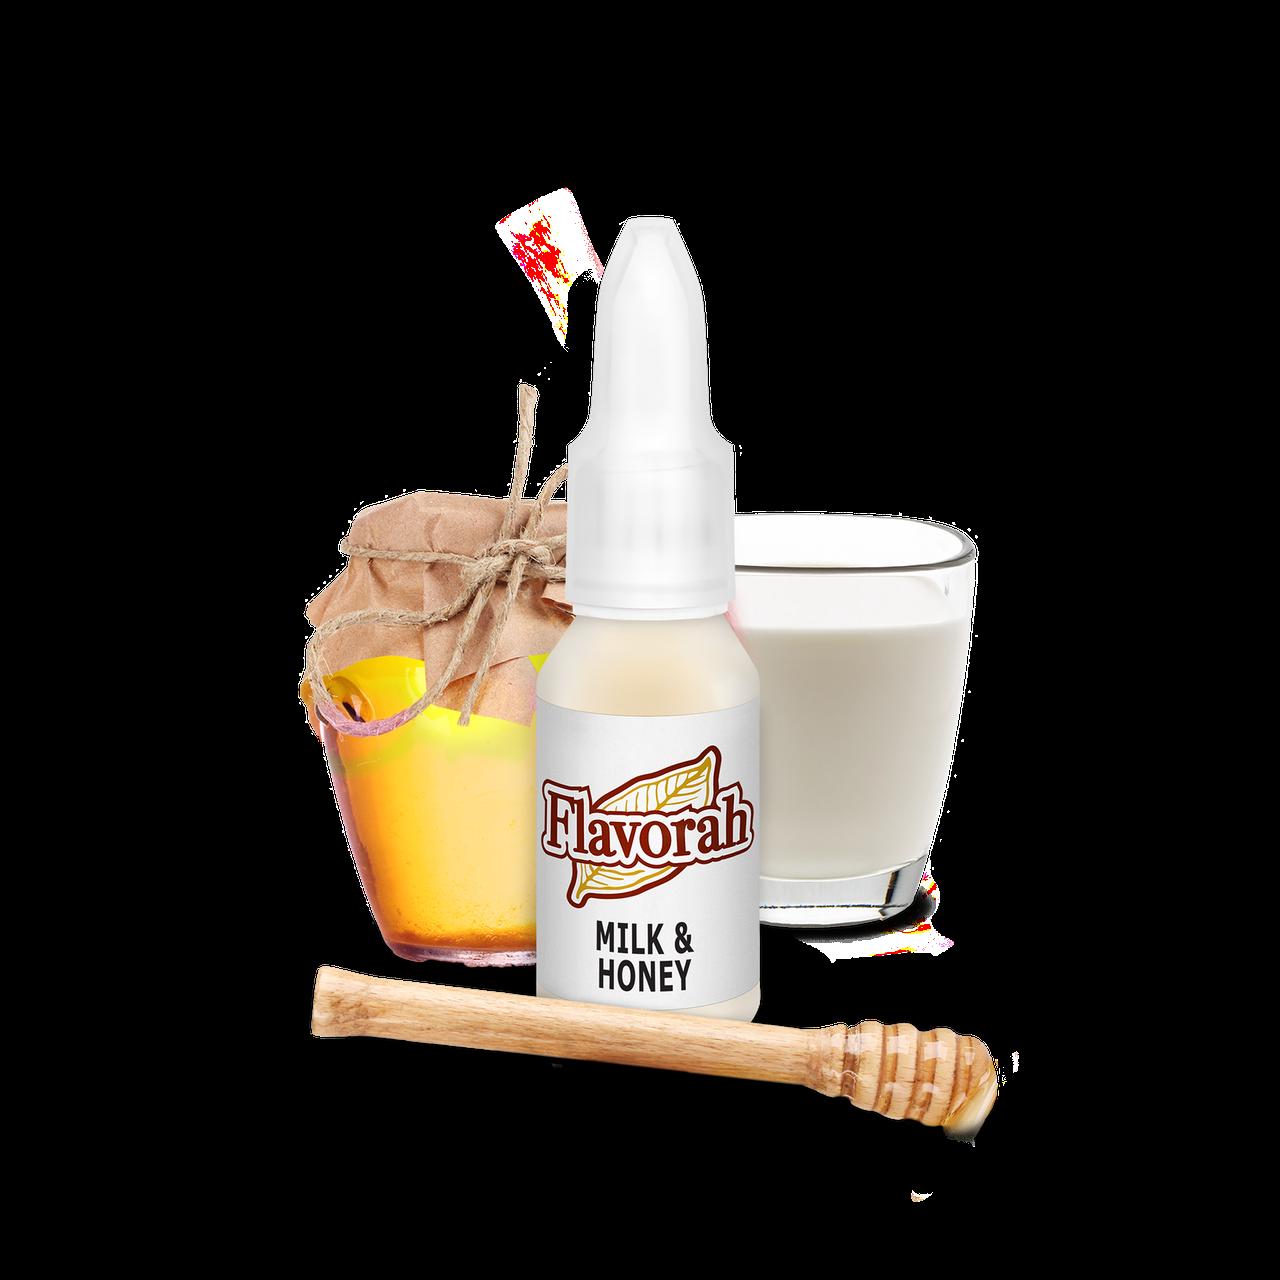 Ароматизатор Flavorah - Milk & Honey (Молоко с мёдом), 15 мл.